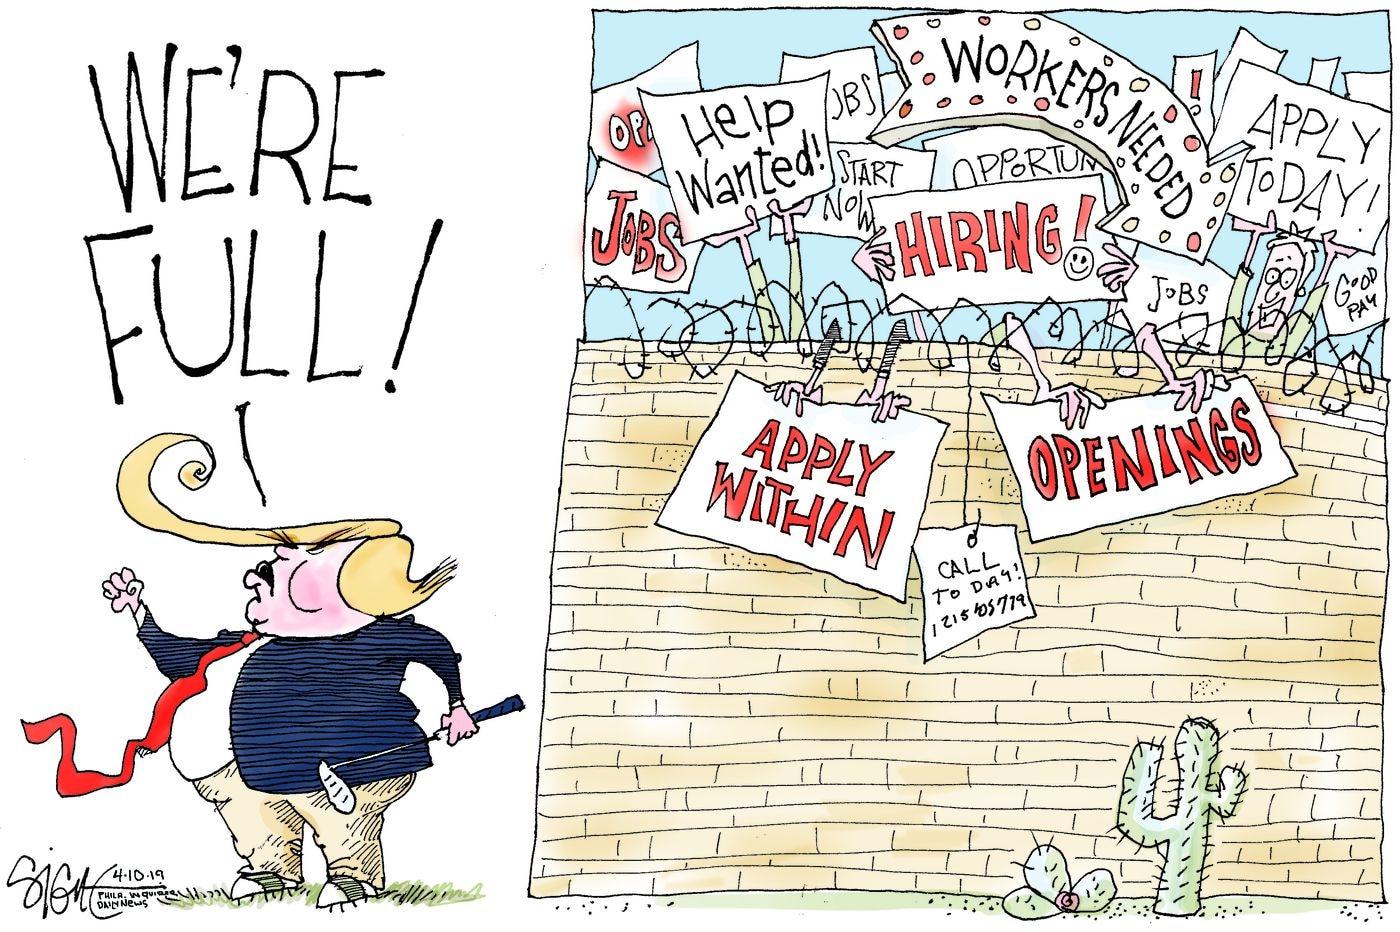 Political Cartoon: WE'RE FULL